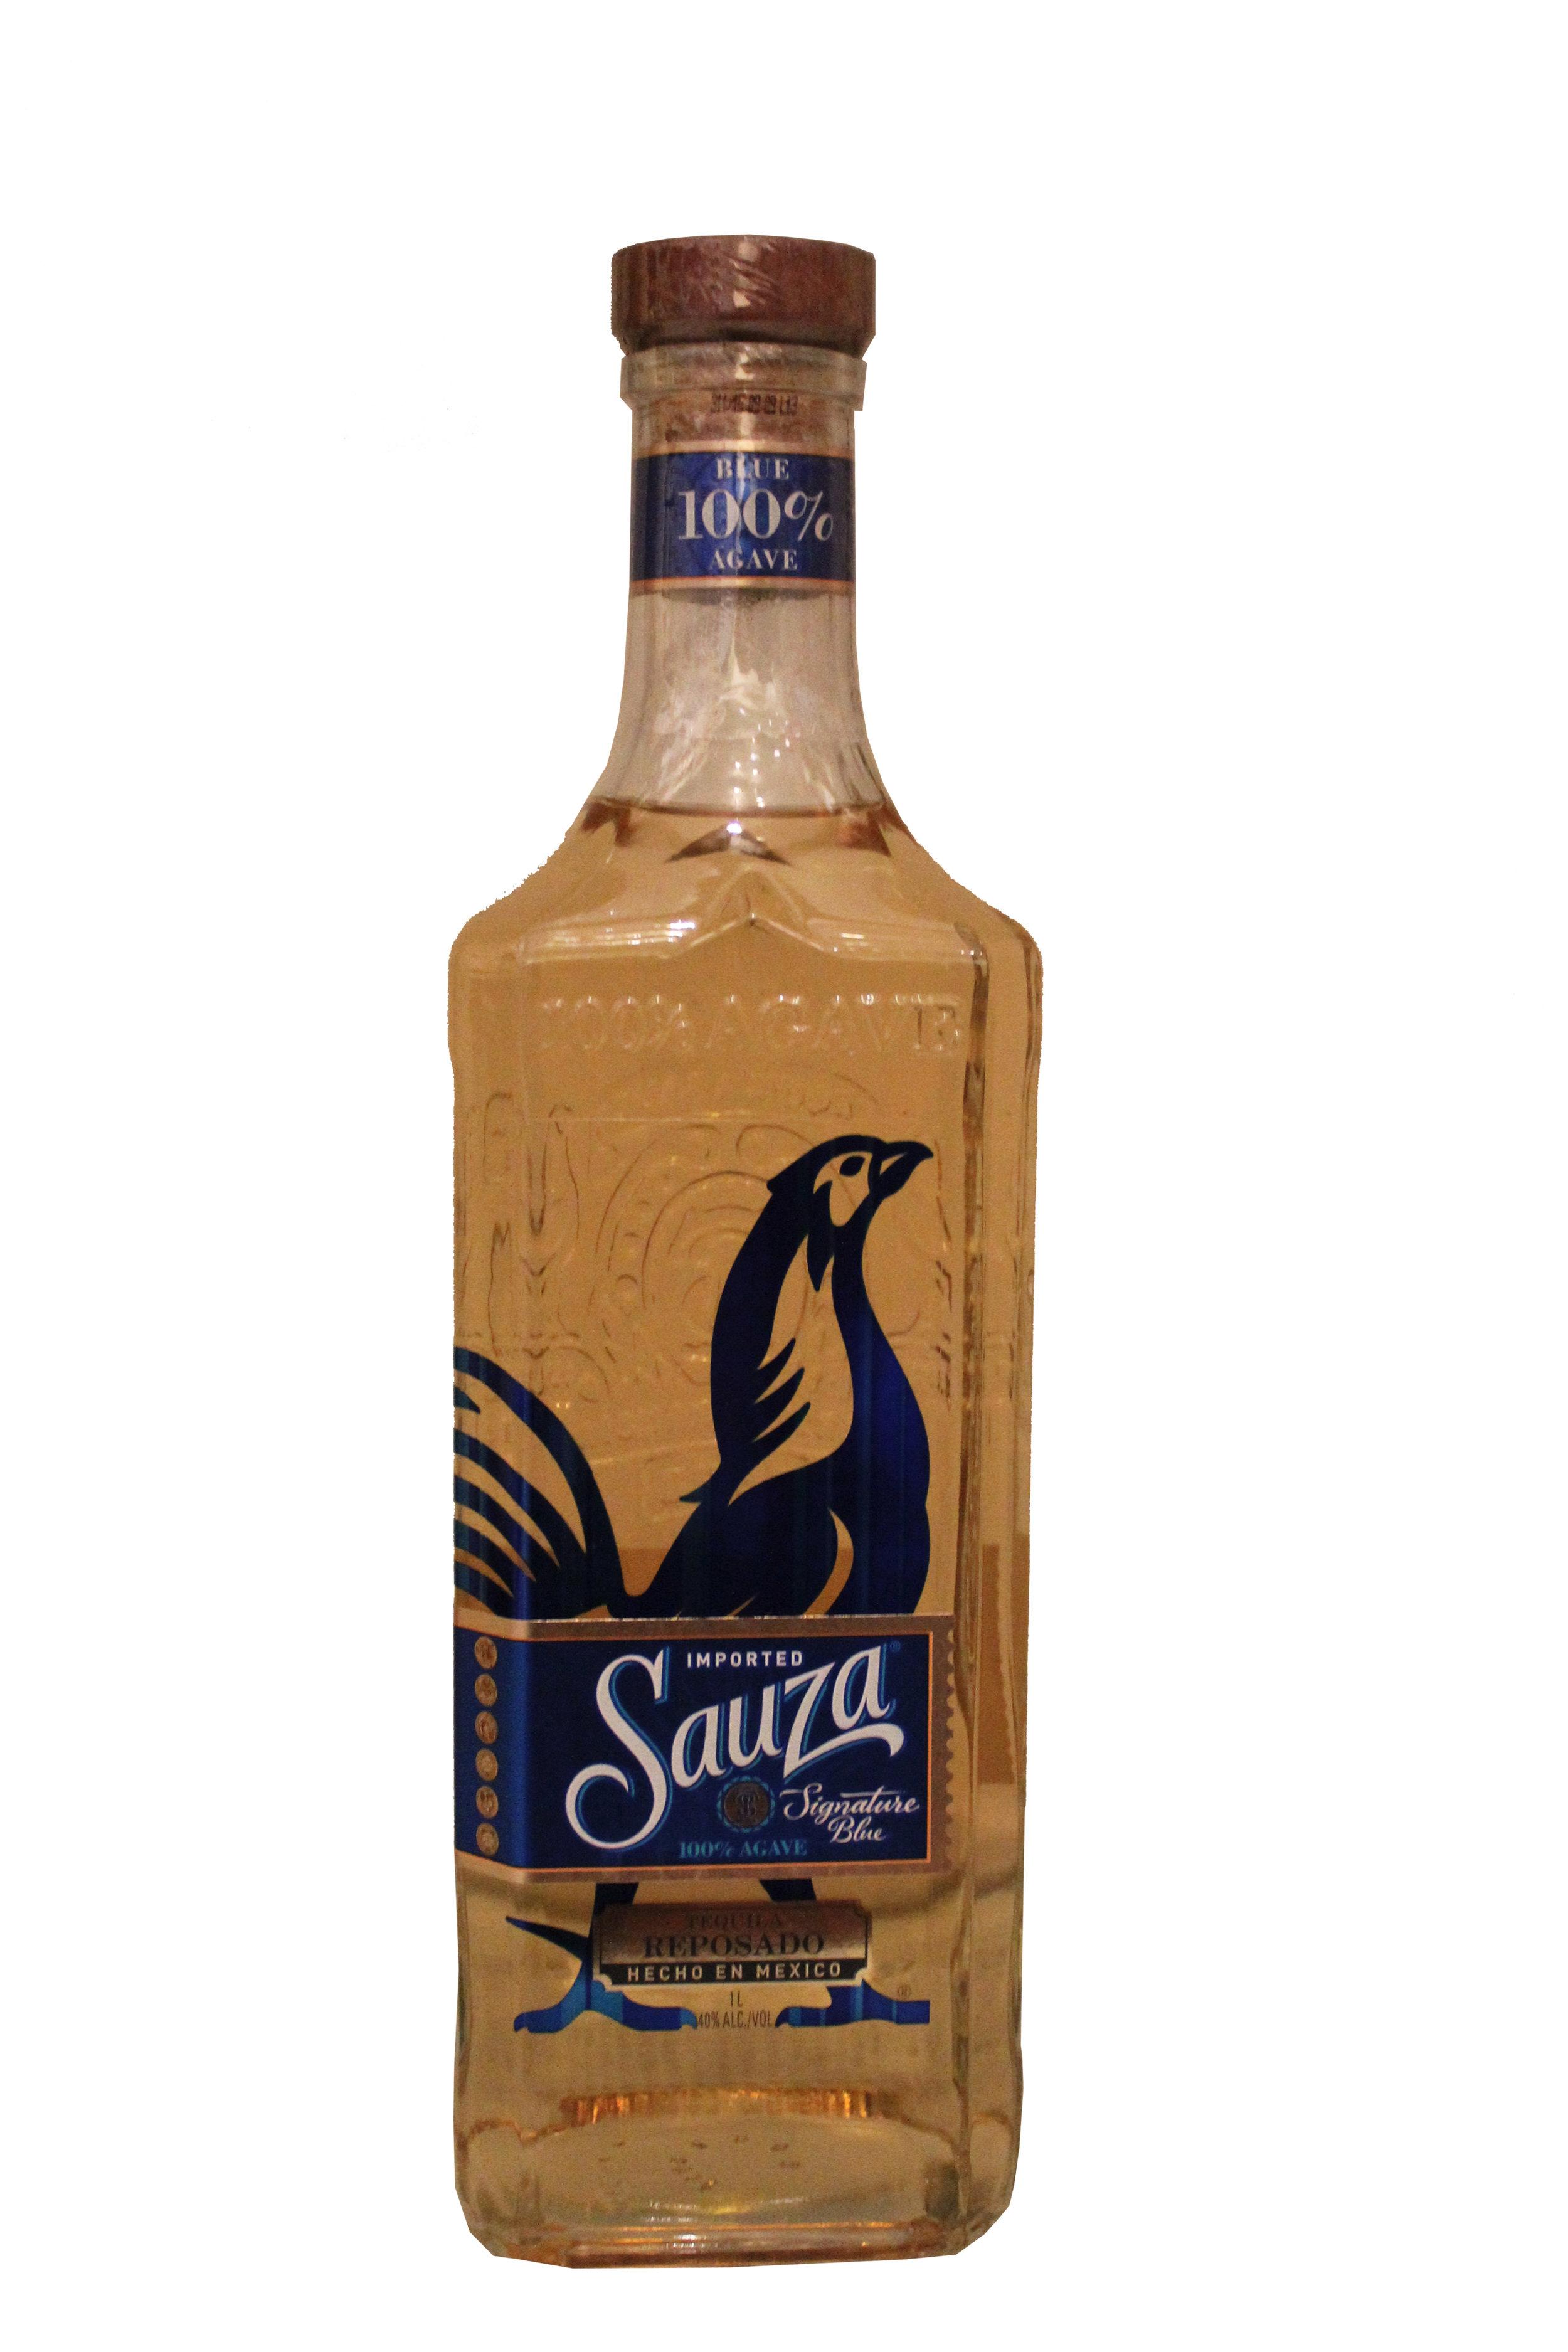 Agave Reposado Tequila  Sauza, Mexico